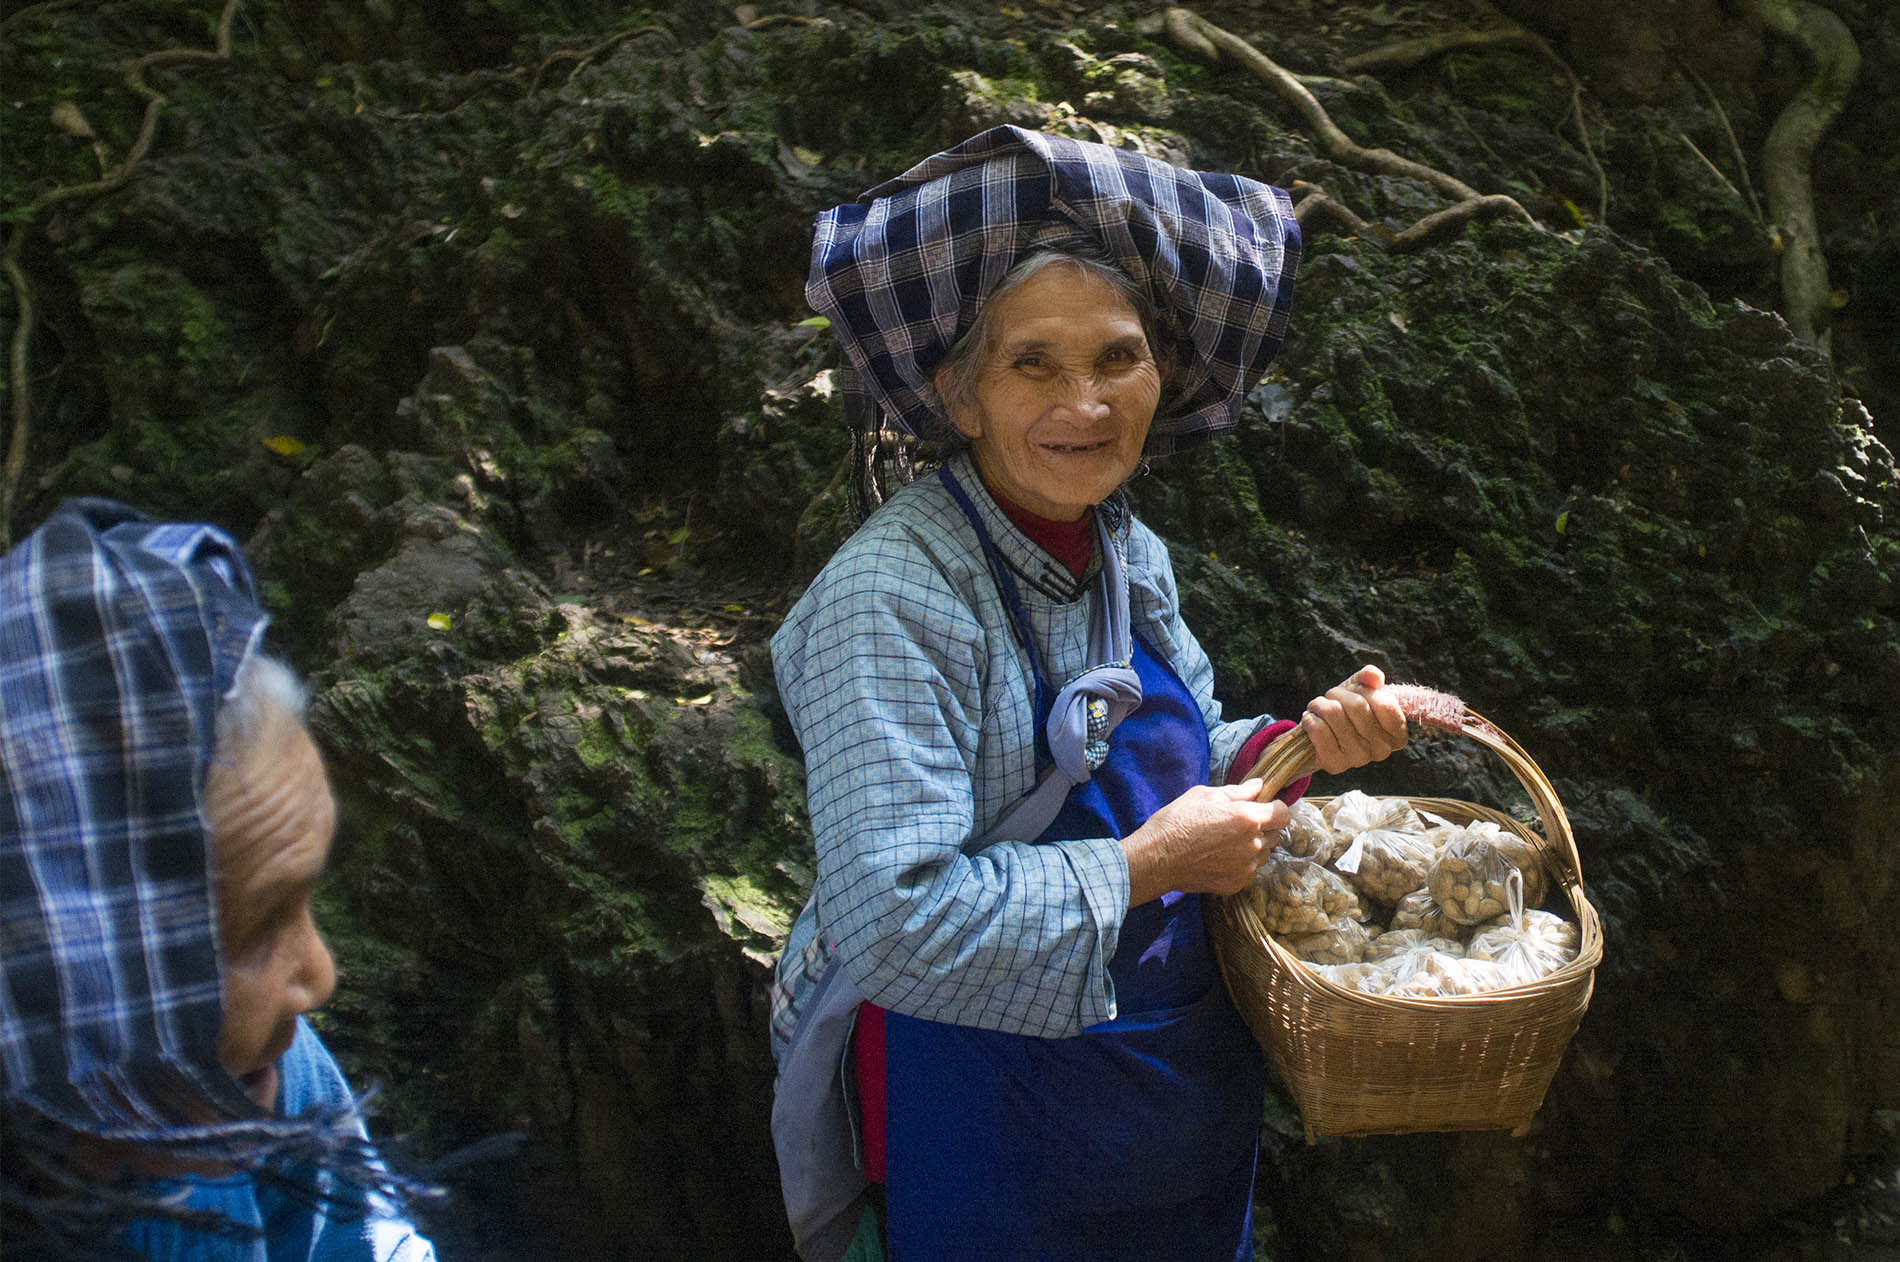 Grandmas selling legal nuts.